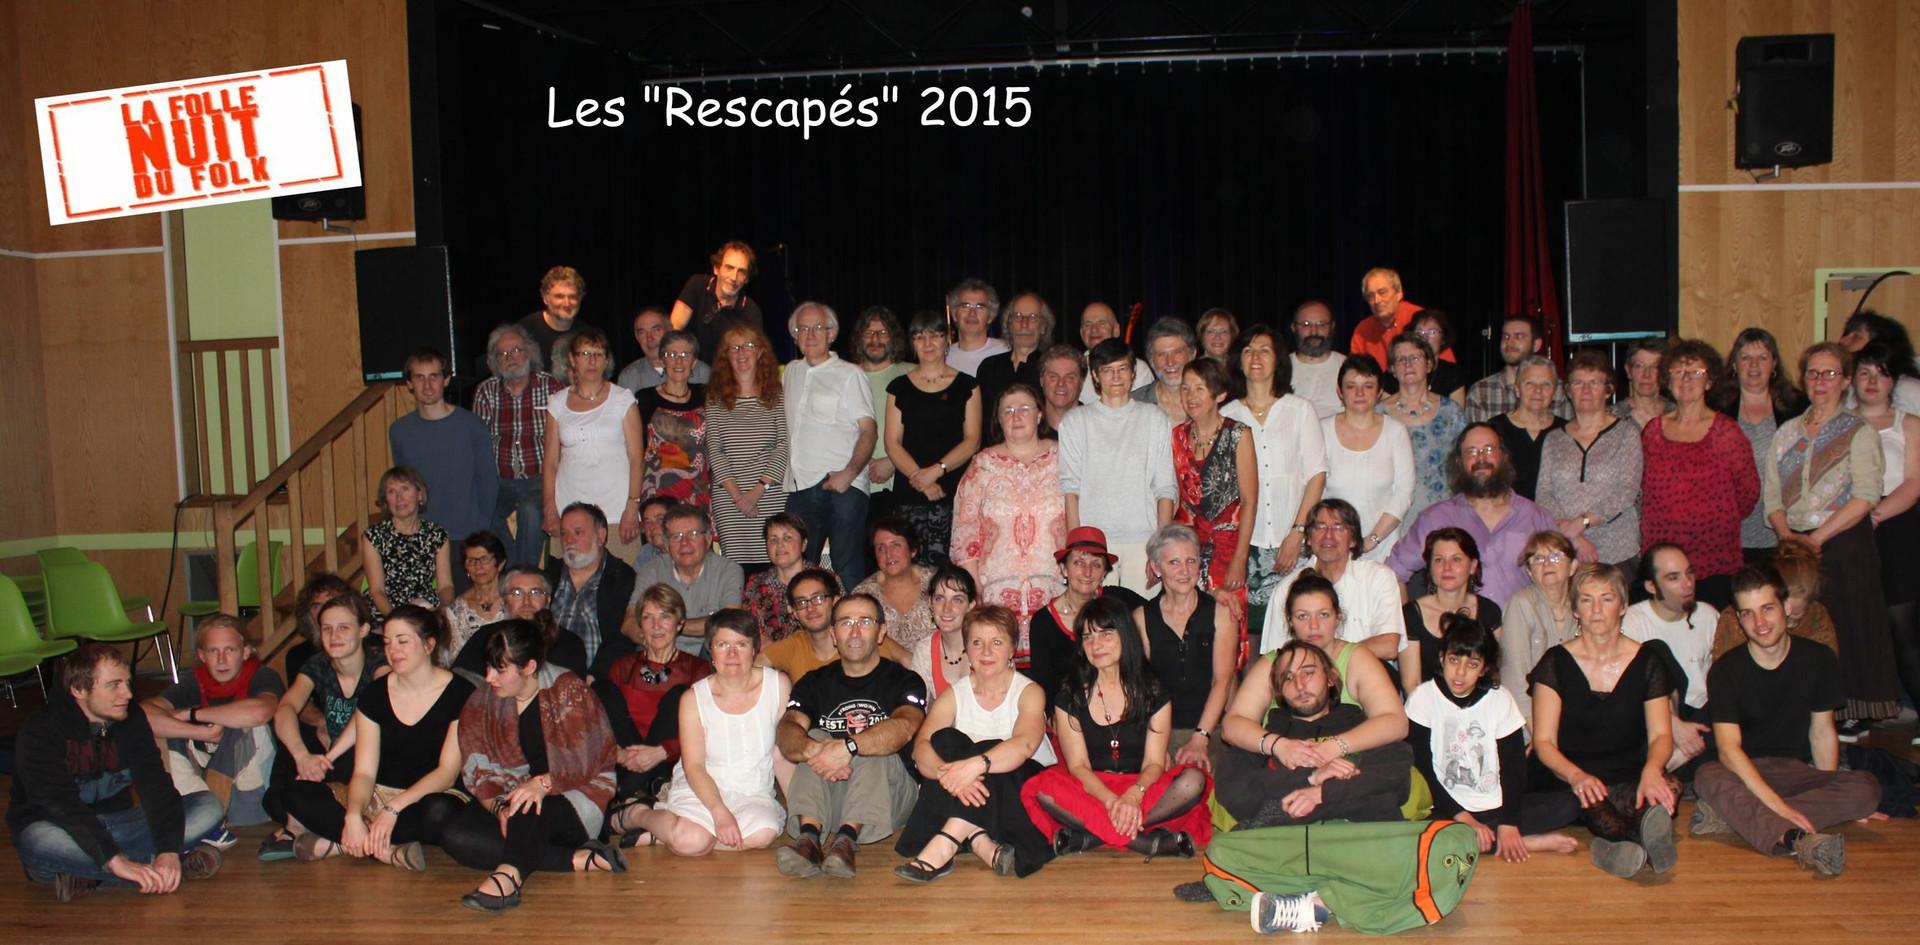 Rescapés Folle Nuit du Folk 2015